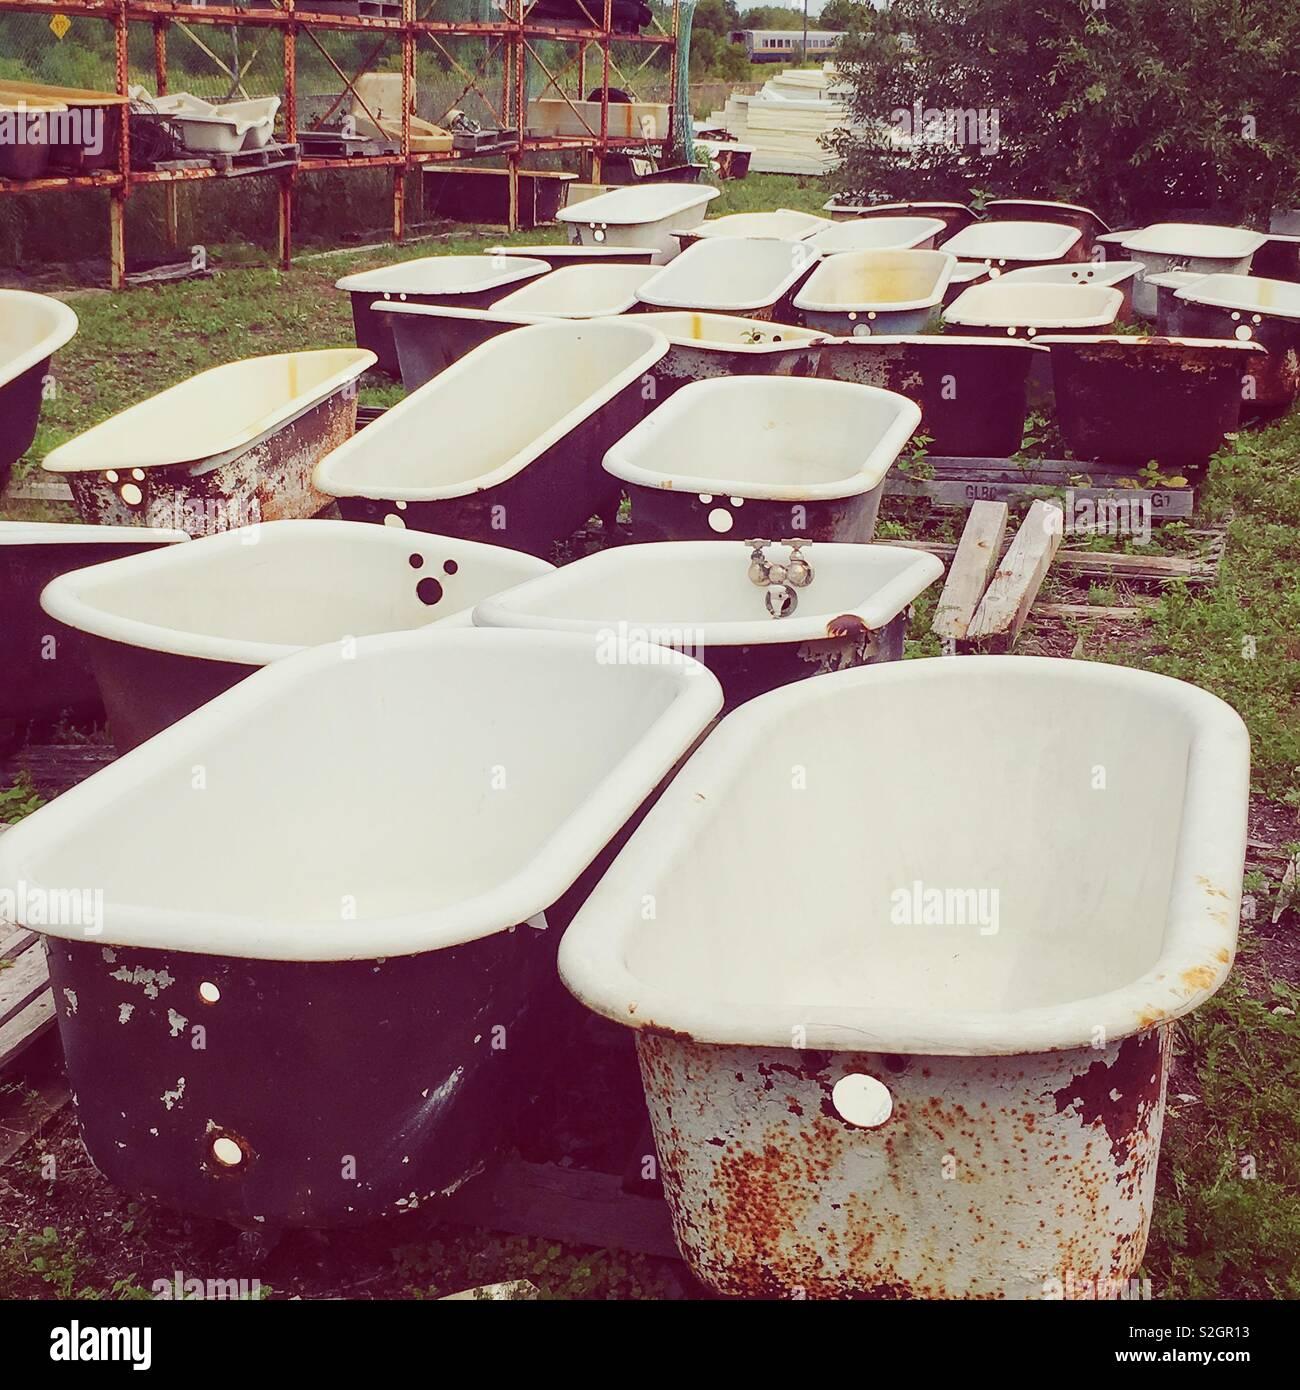 Bañera descansando motivos, agrupación de vintage bañeras almacenados al aire libre en un campo. Imagen De Stock